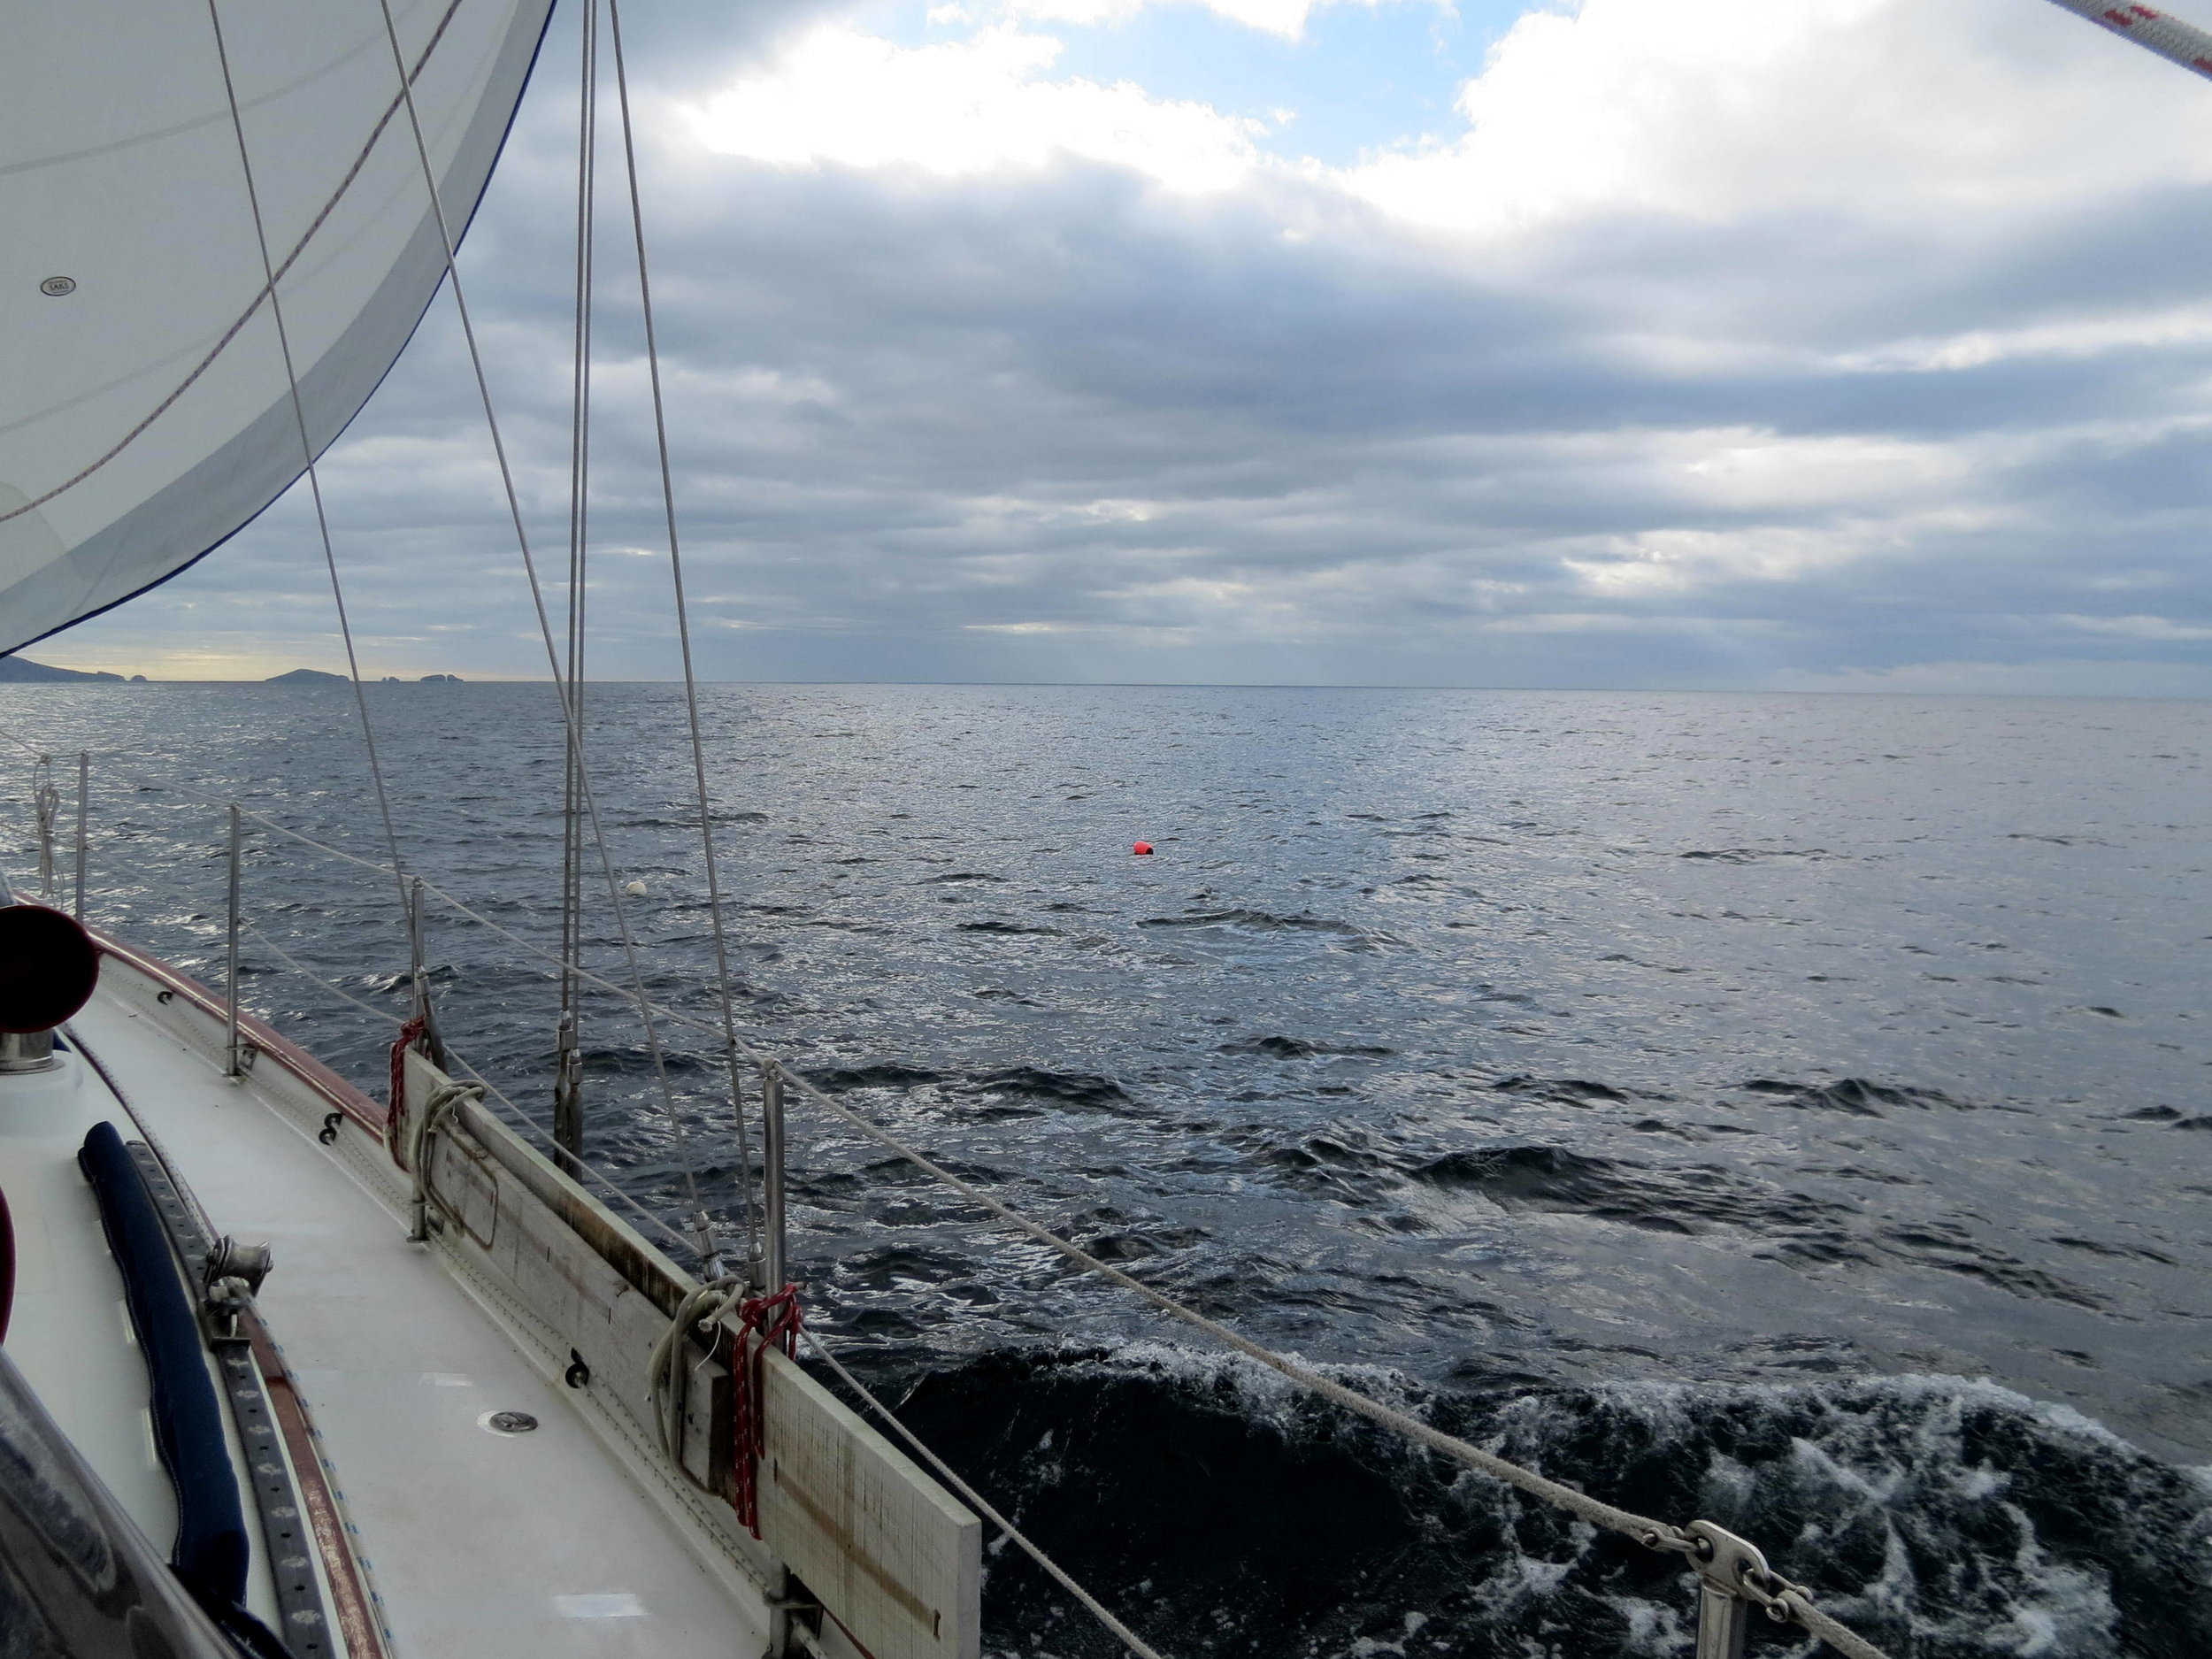 En route up the wild Tasmanian east coast